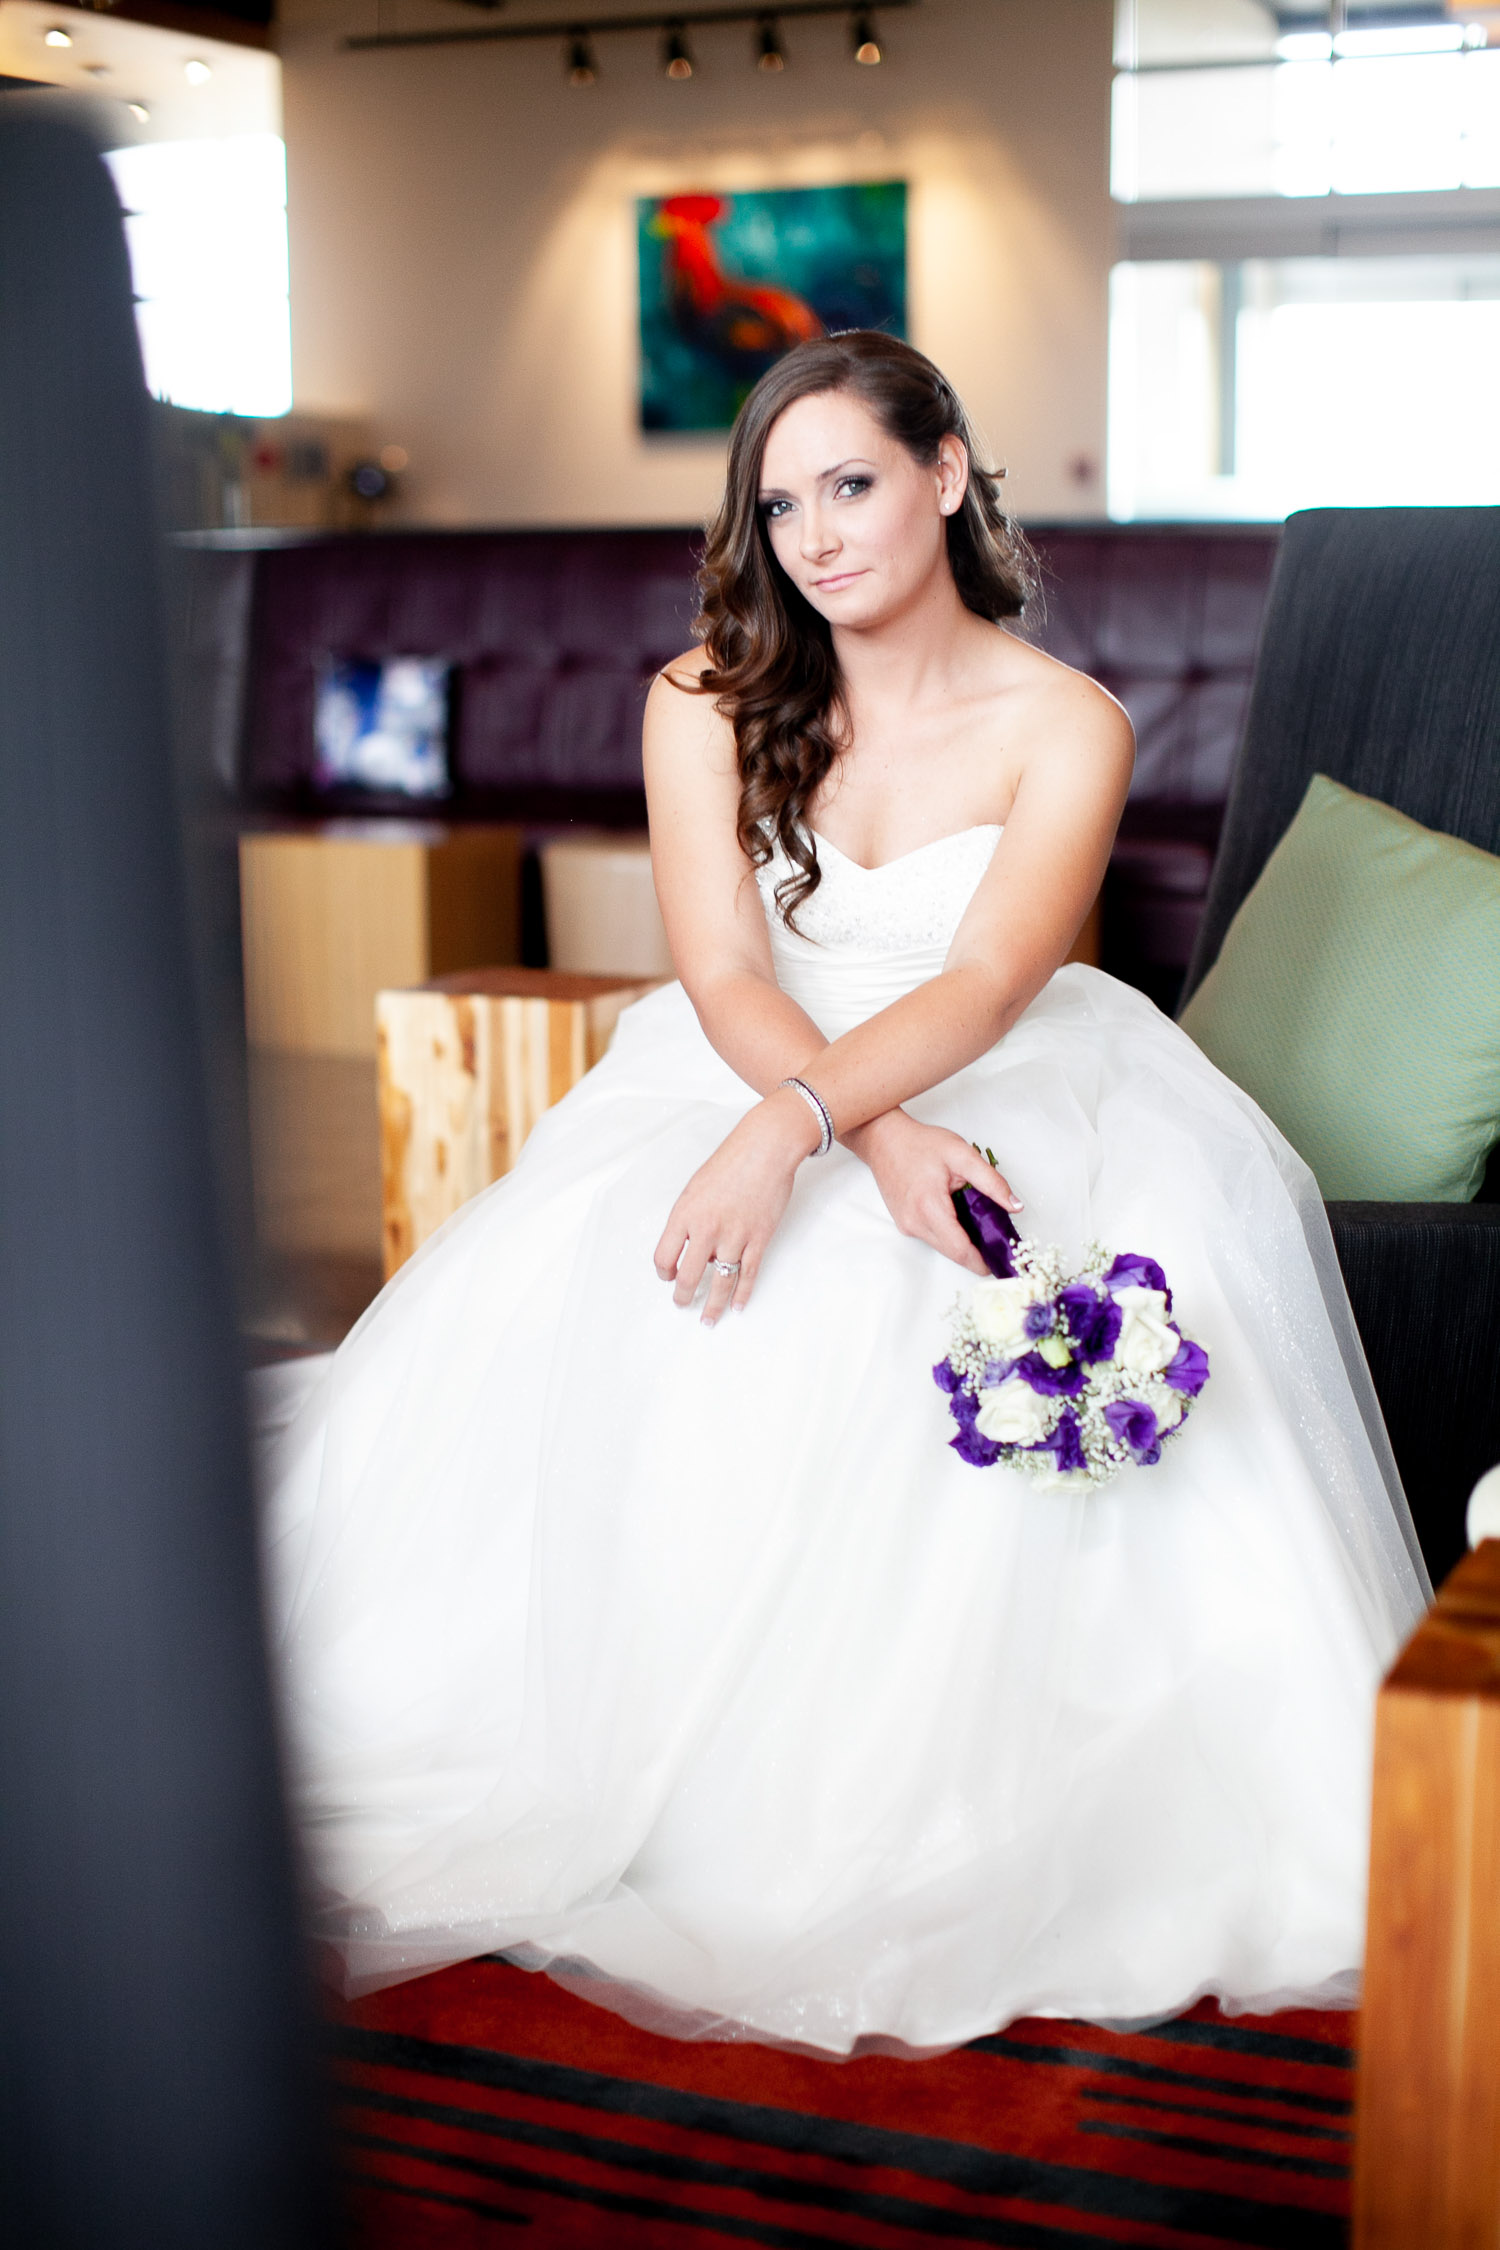 JMPHOTOART-Wedding-Photographer-185.jpg